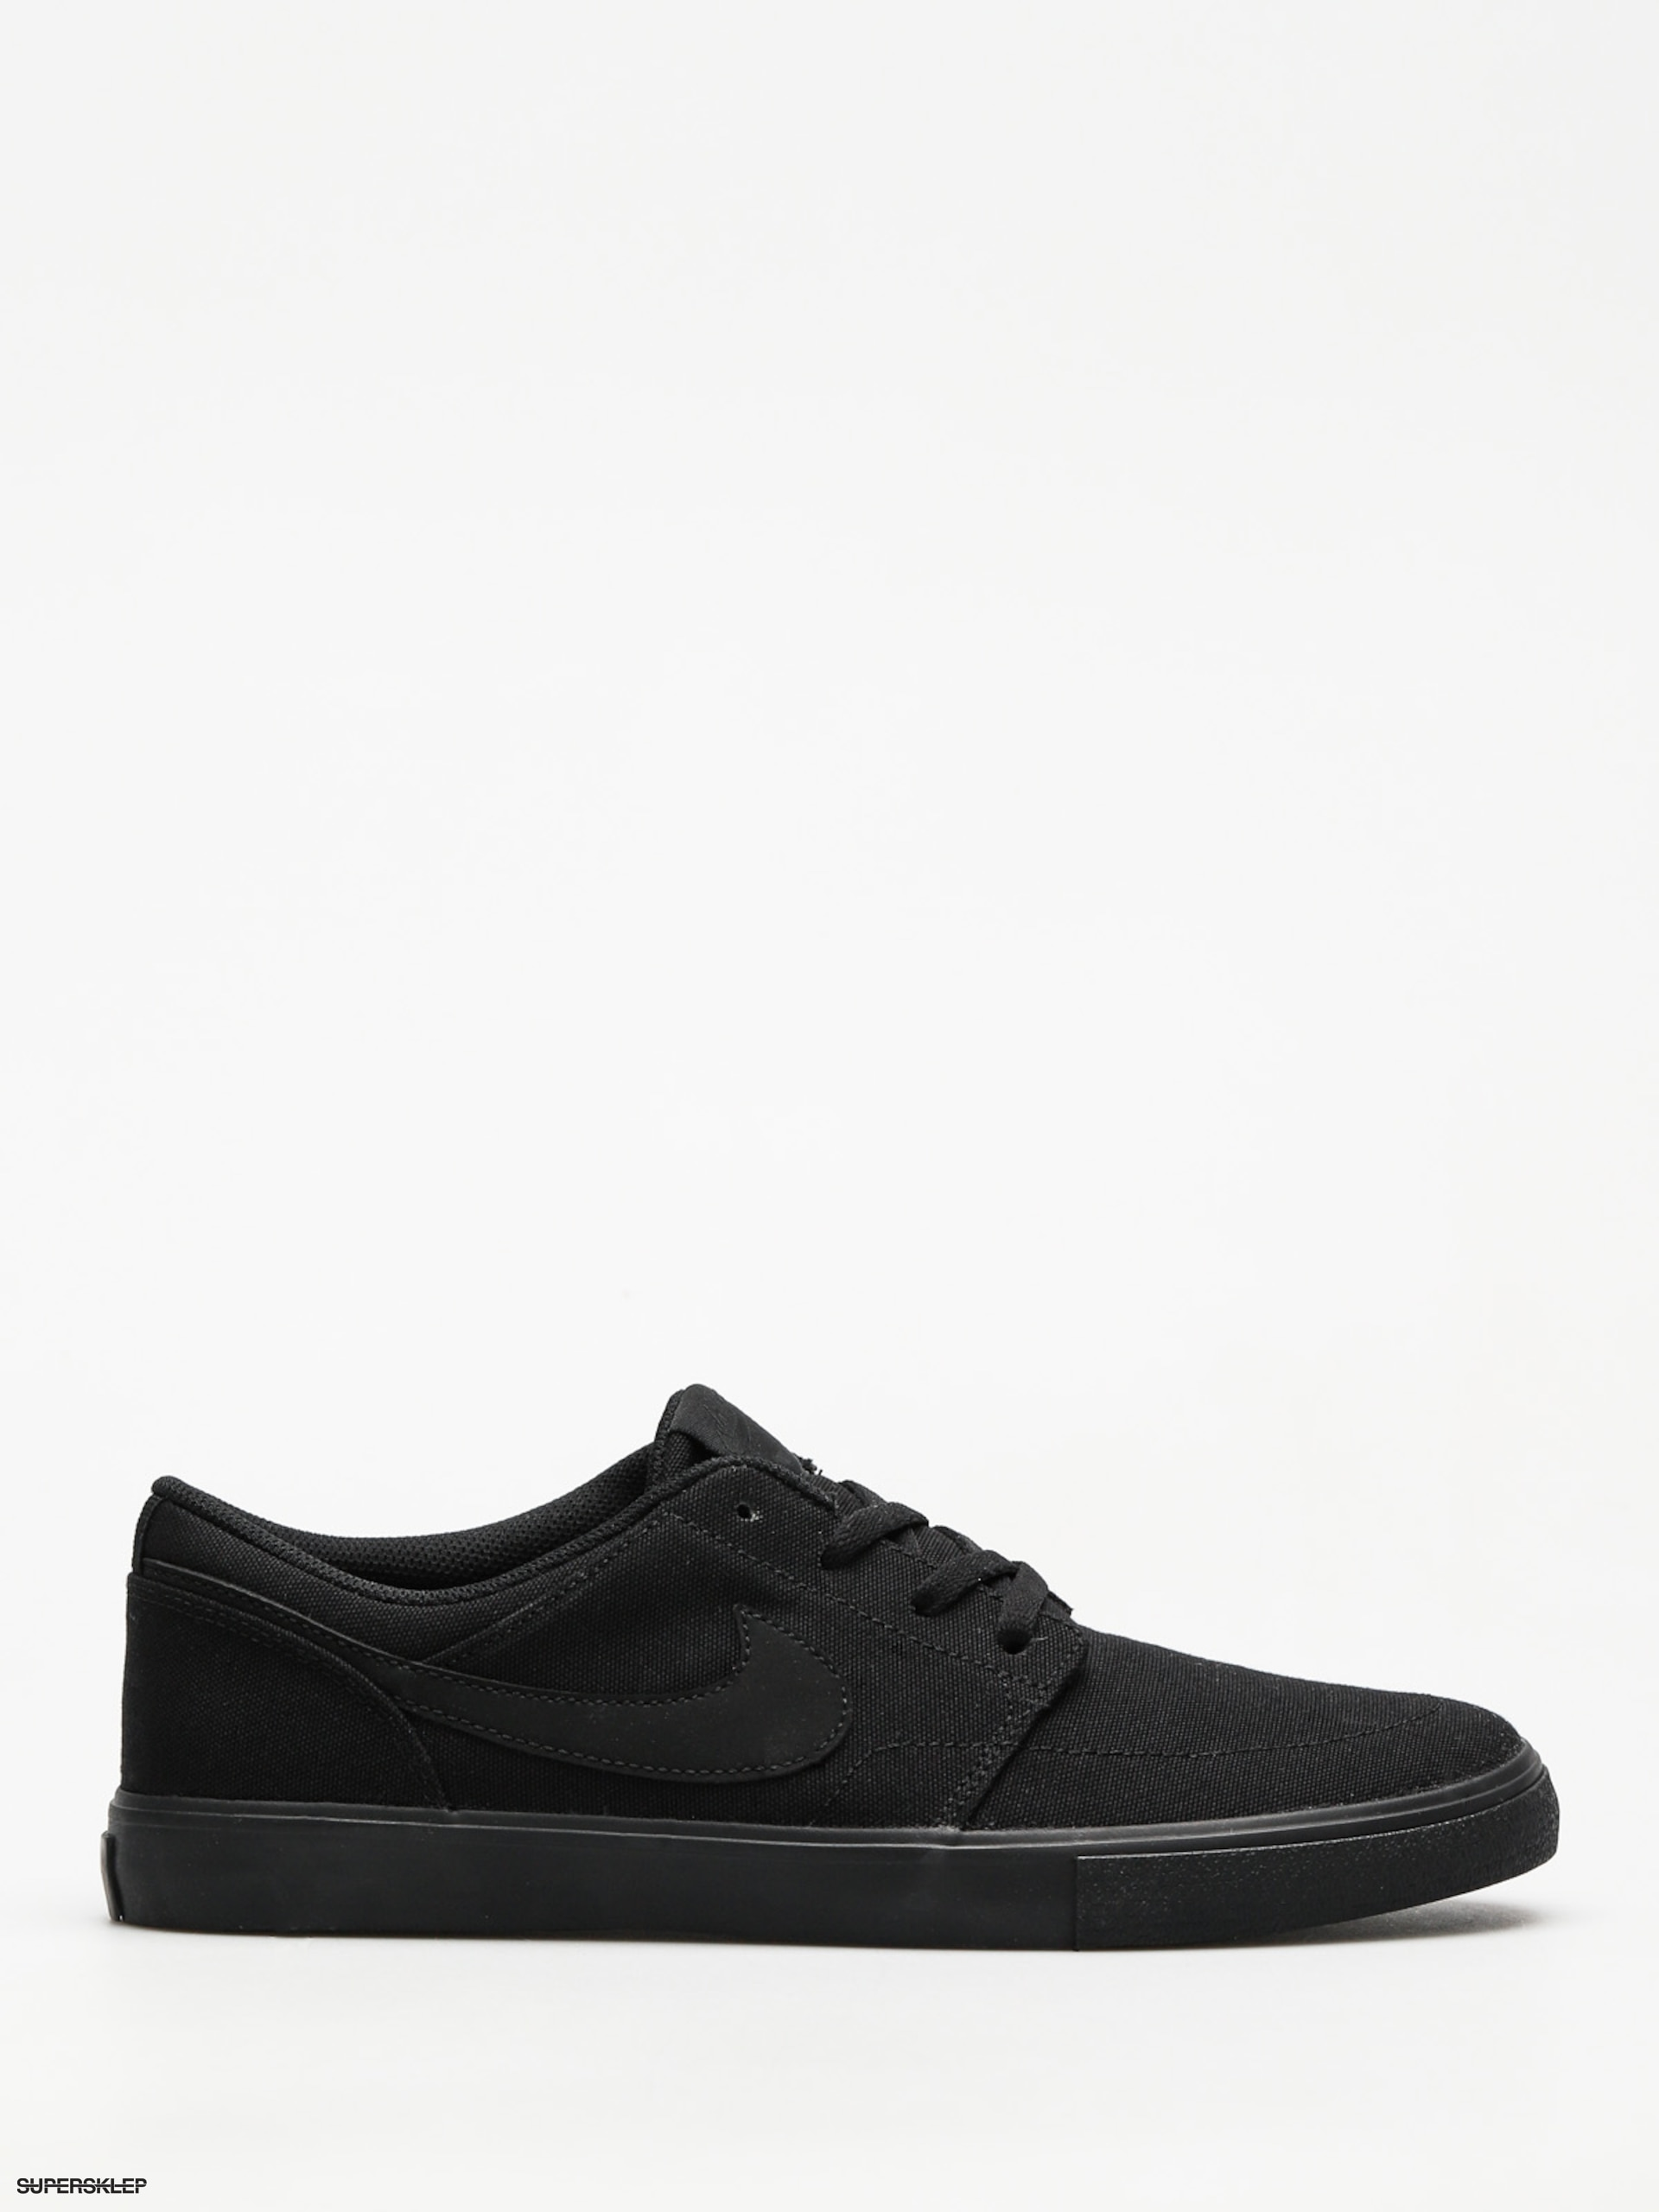 635010466892 Boty Nike SB Portmore II Solar Cnvs (black black)